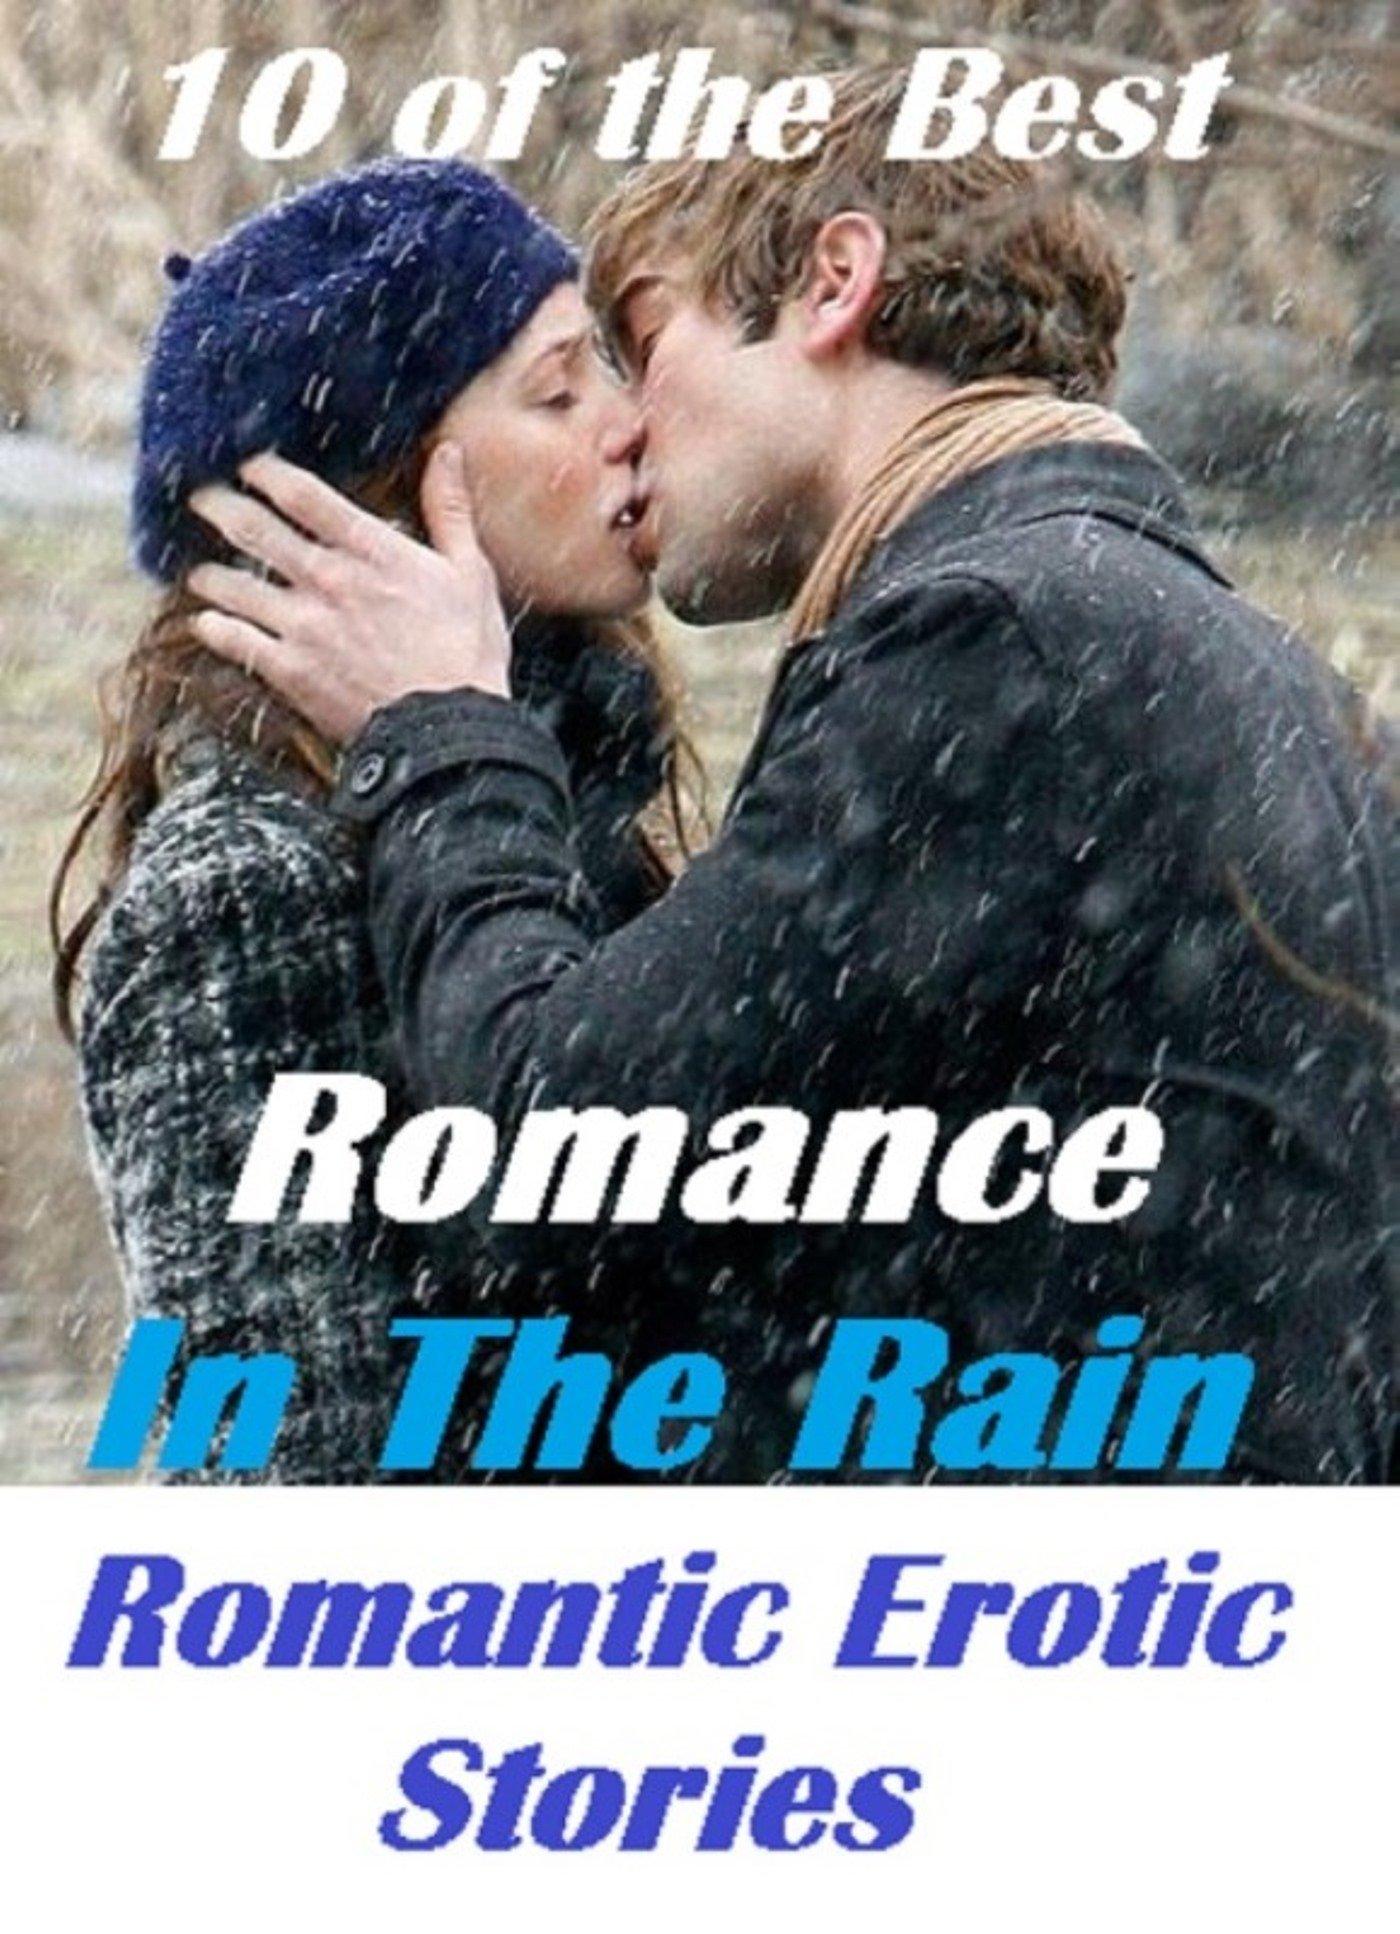 Romance in the Rain, Romantic Erotic Stories: Erotic Romantic Stories:  9781102827009: Amazon.com: Books